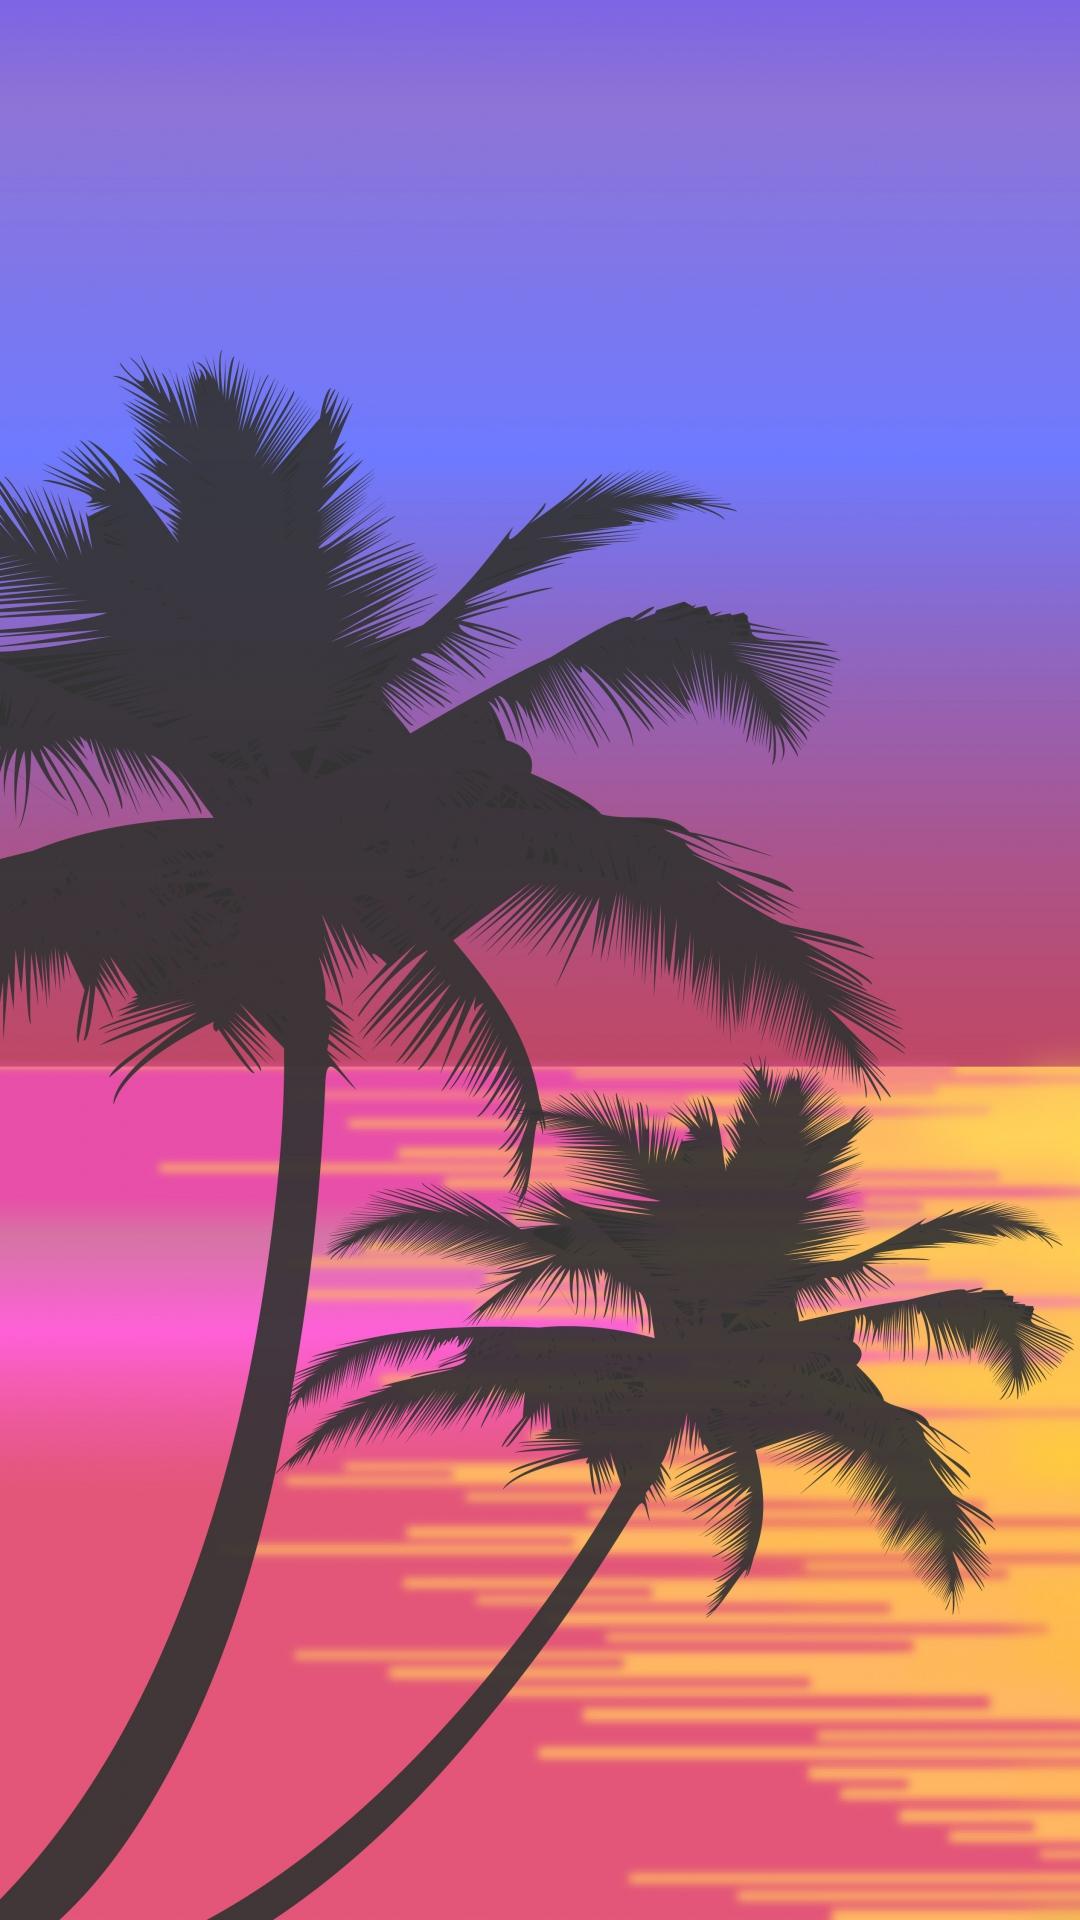 iphone wallpaper palms vector art Palm tree